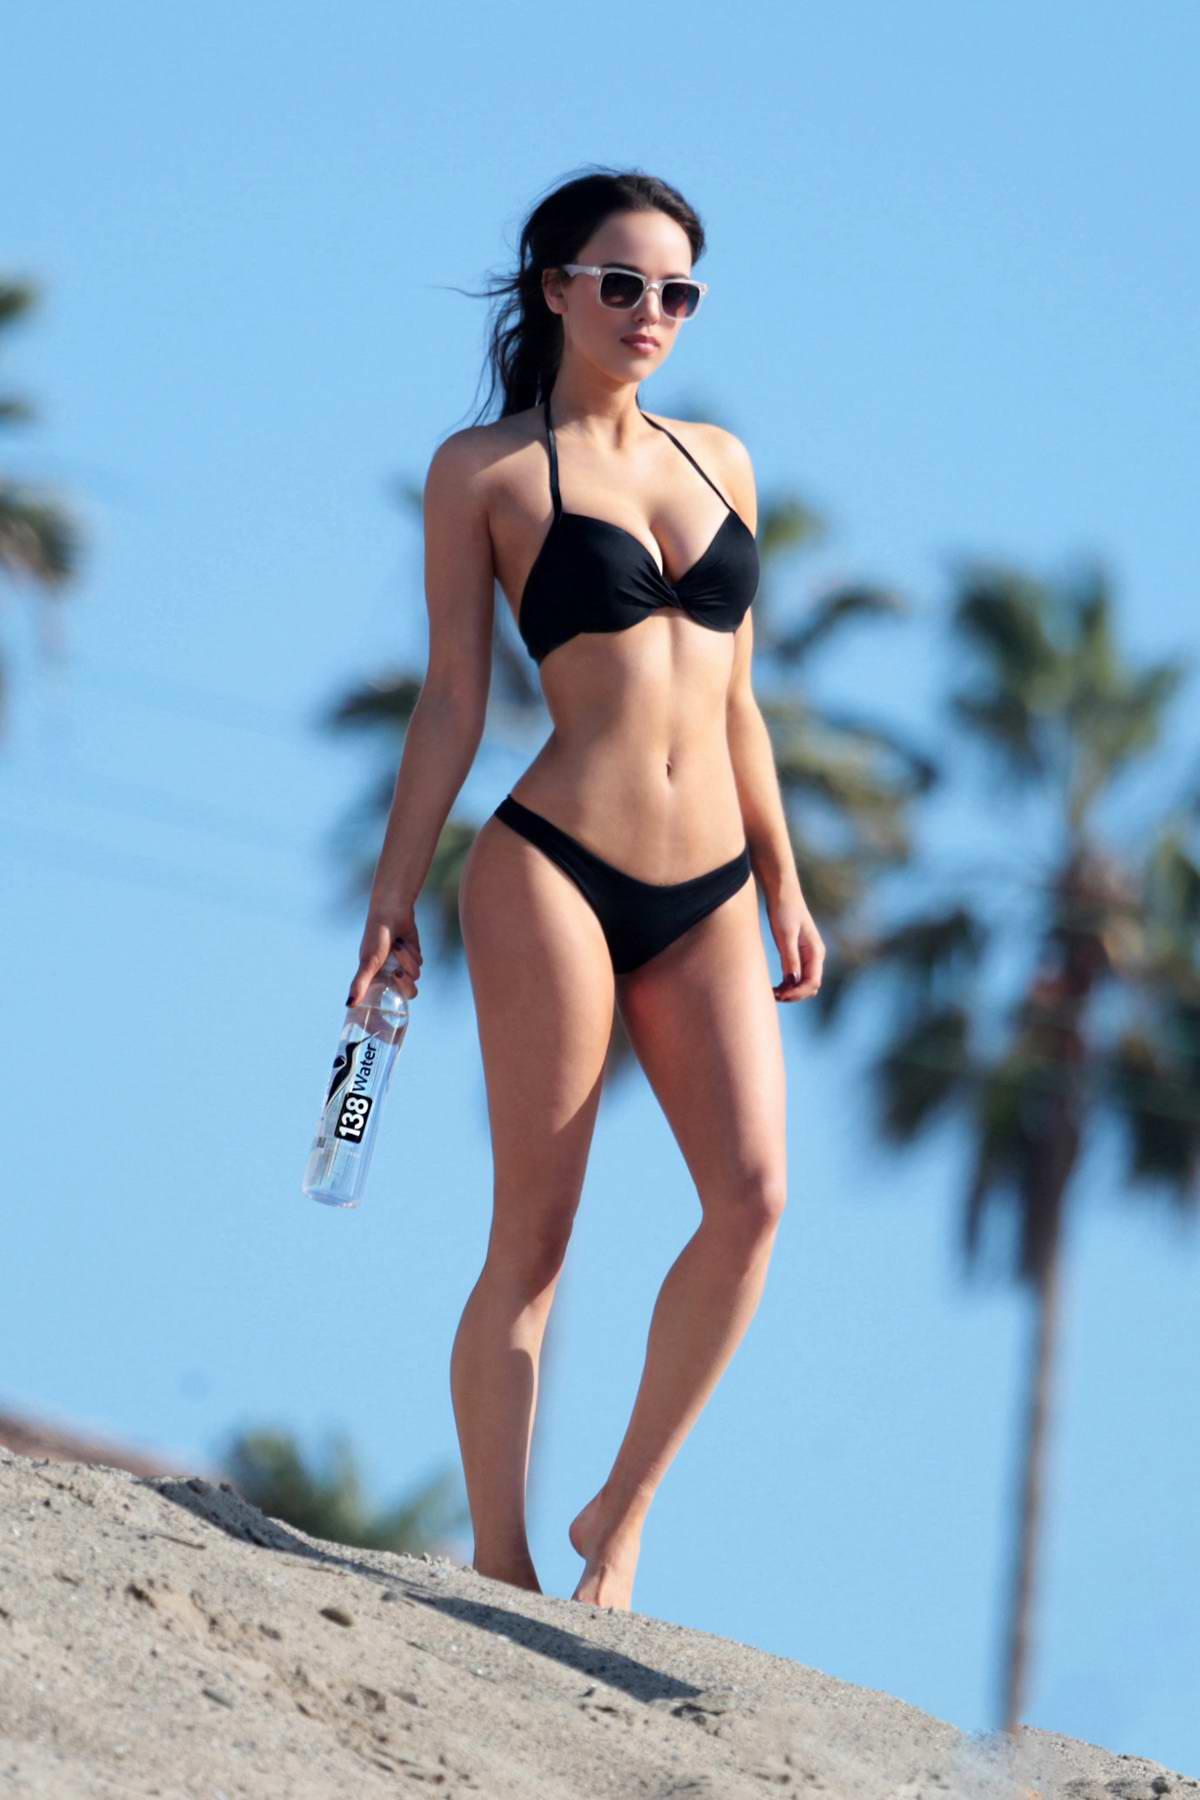 Cate Chant poses in a black bikini during a beach photoshoot for 138 Water in Malibu, California